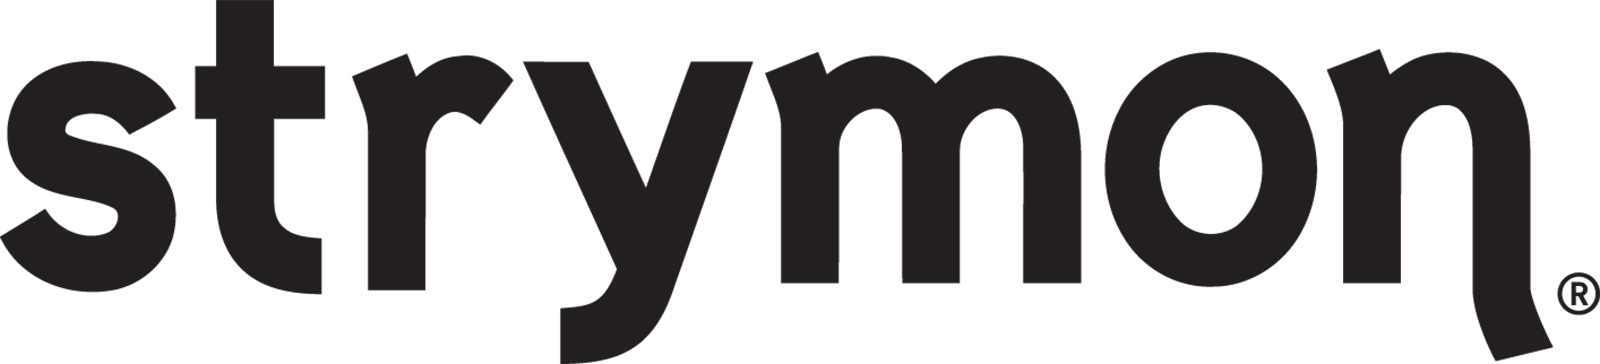 strymon logo